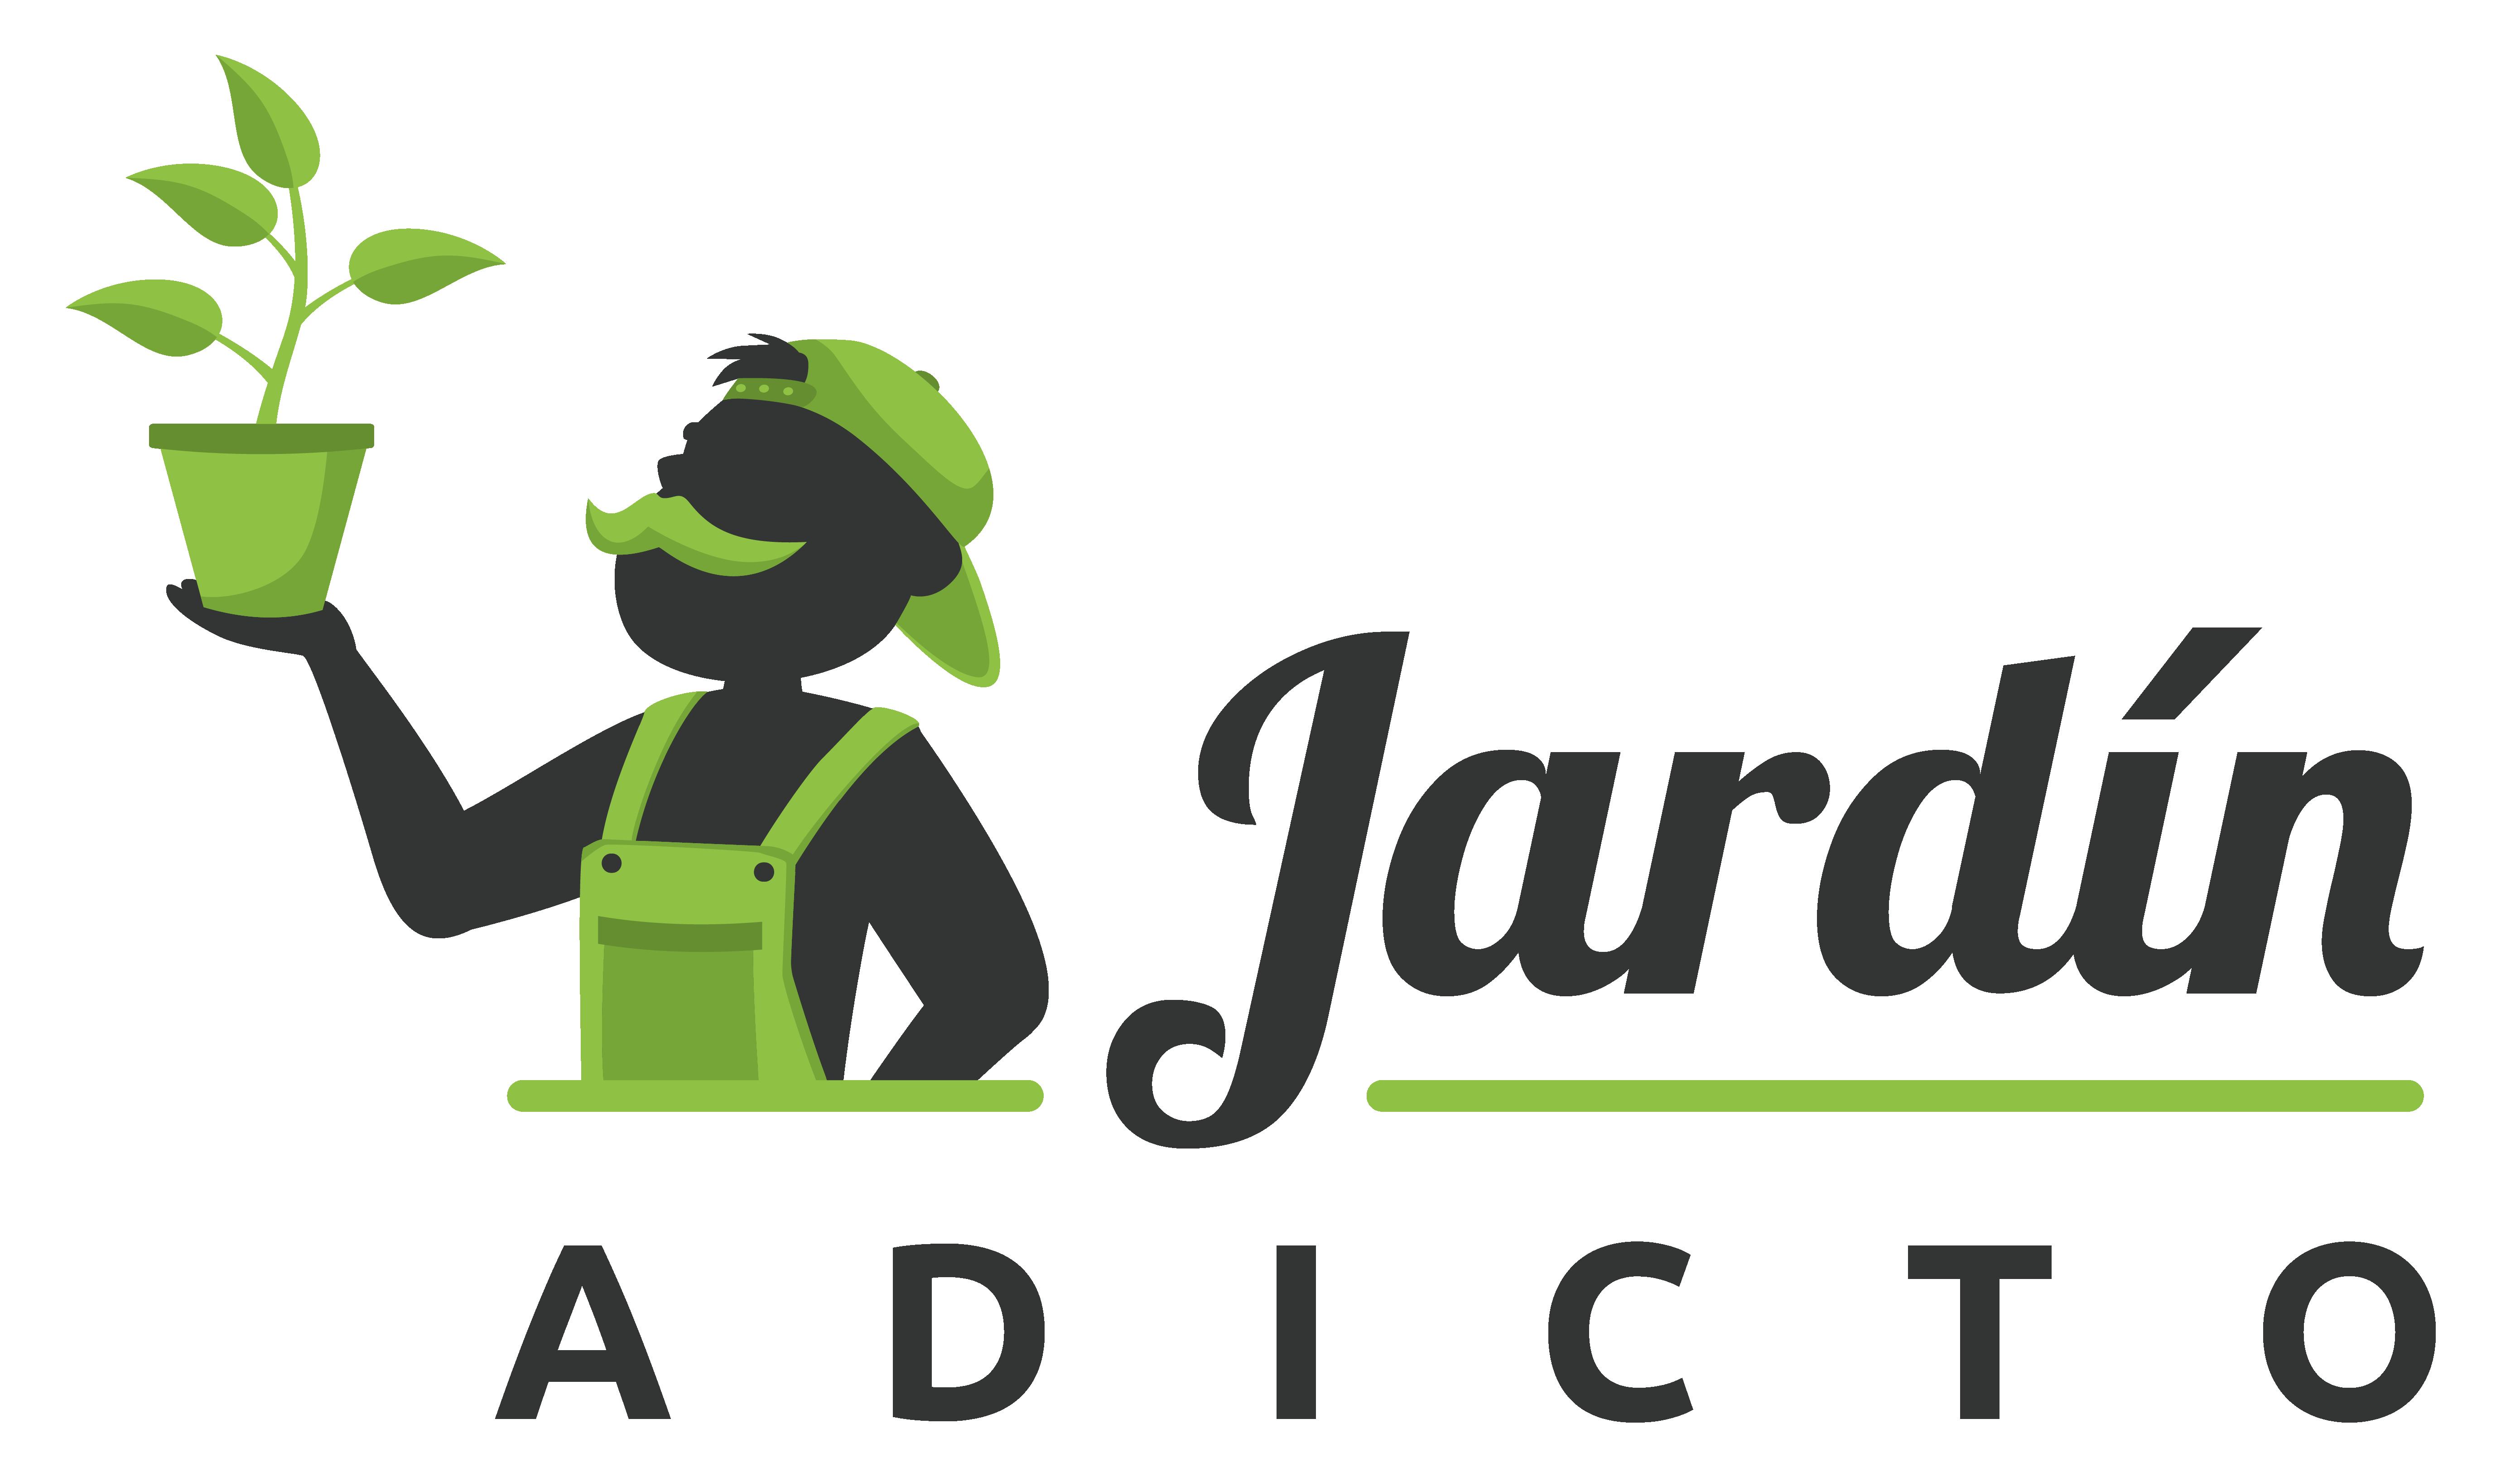 Jardin Adicto